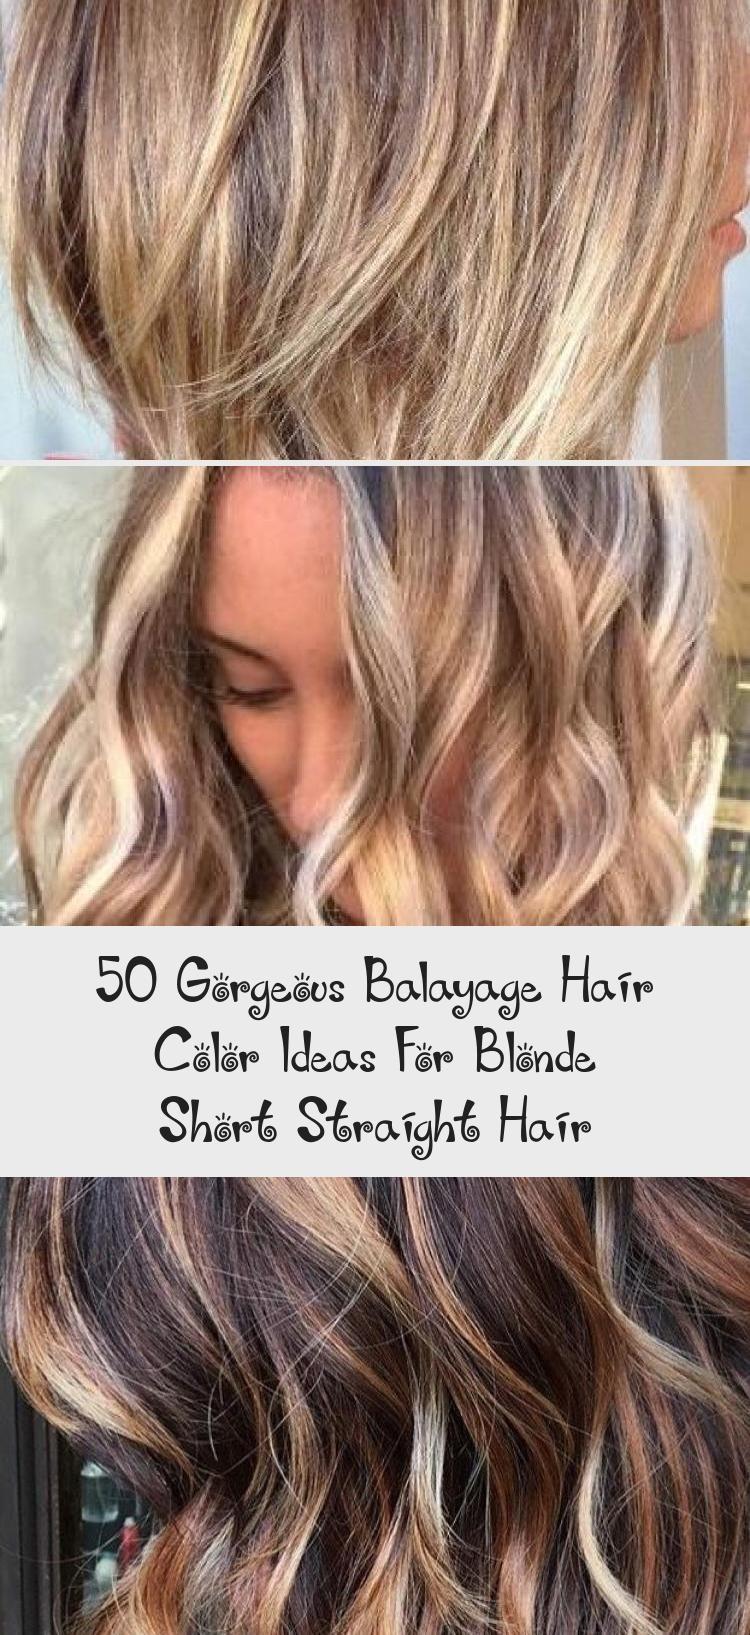 50 Gorgeous Balayage Hair Color Ideas For Blonde Short Straight Hair Balayagehairpastel Balayagehairvid In 2020 Balayage Hair Short Straight Hair Hair Color Balayage